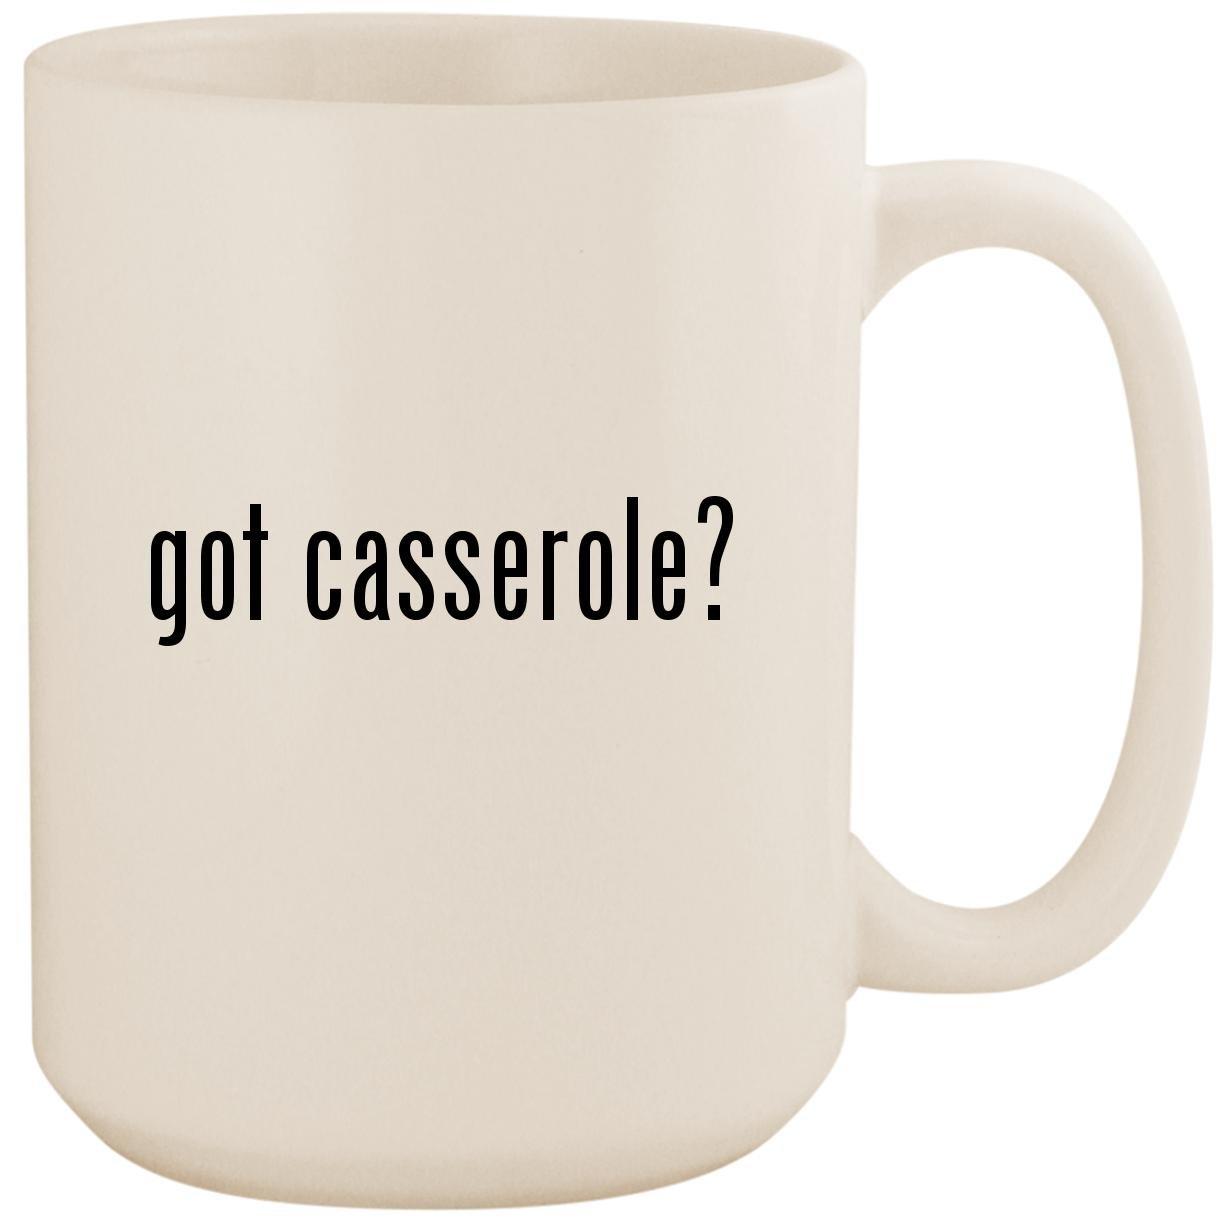 got casserole? - White 15oz Ceramic Coffee Mug Cup